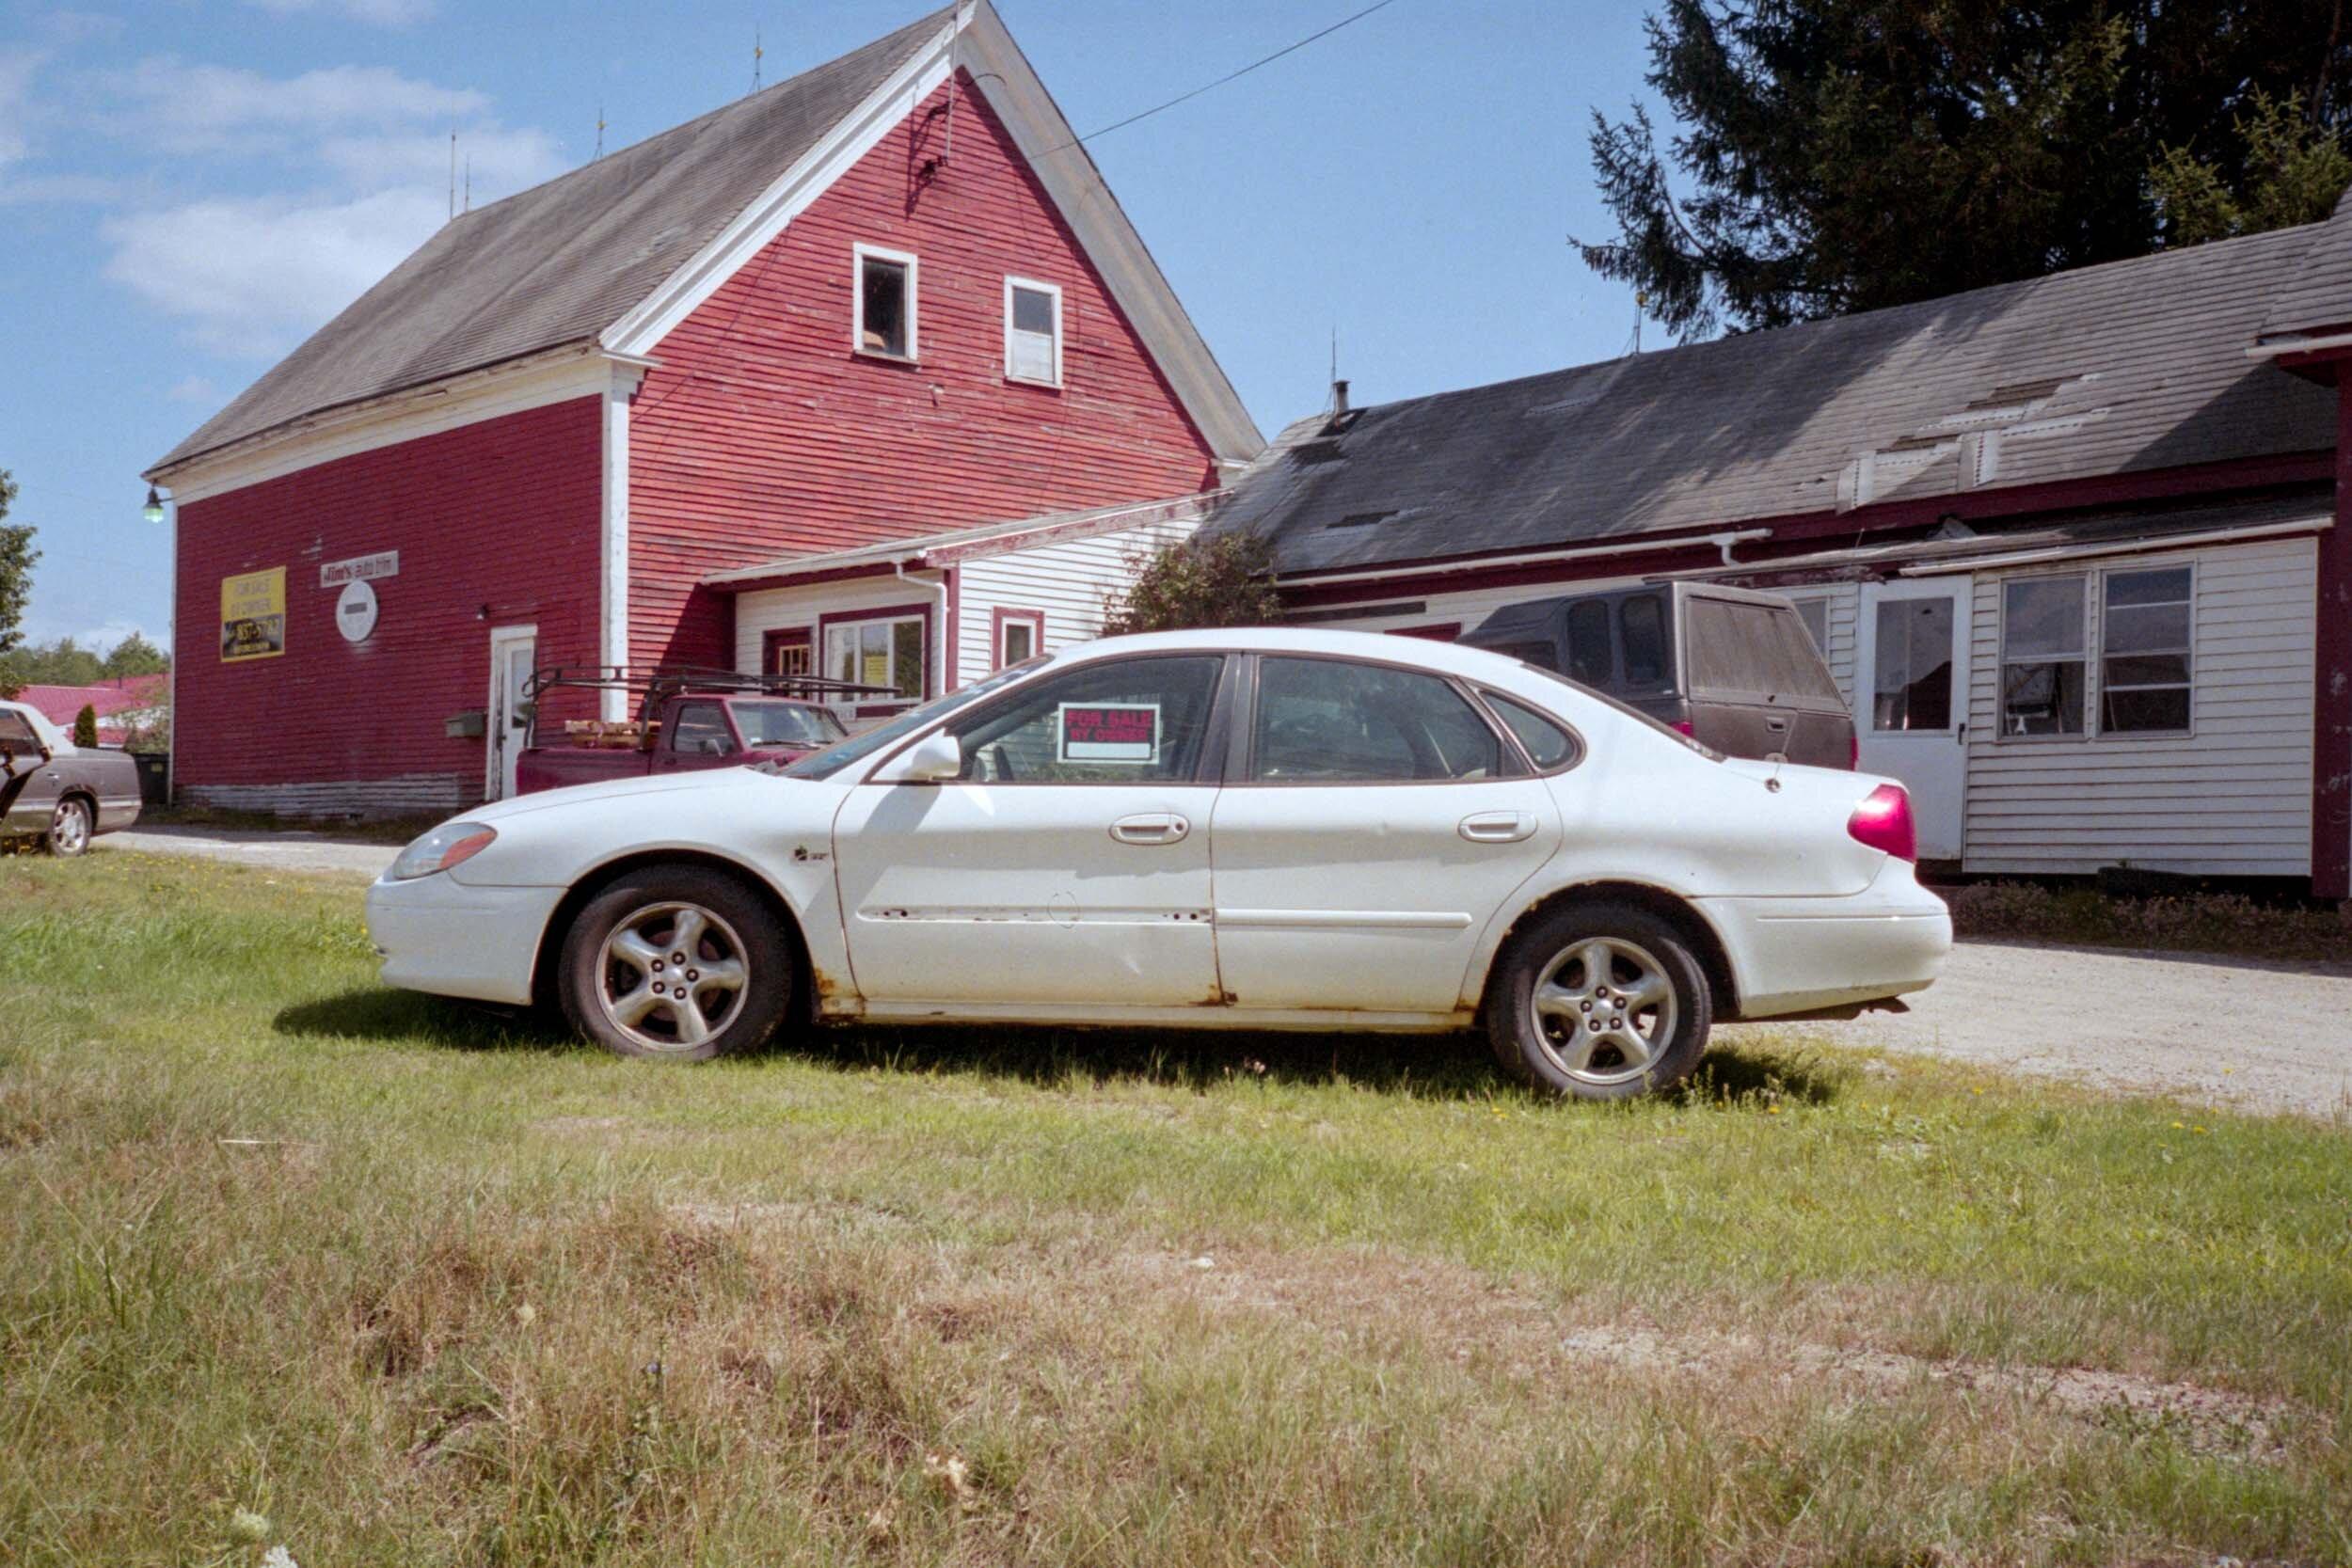 Sebastian Siadecki Car Sale 15 2017-070S 12 Maine.jpg